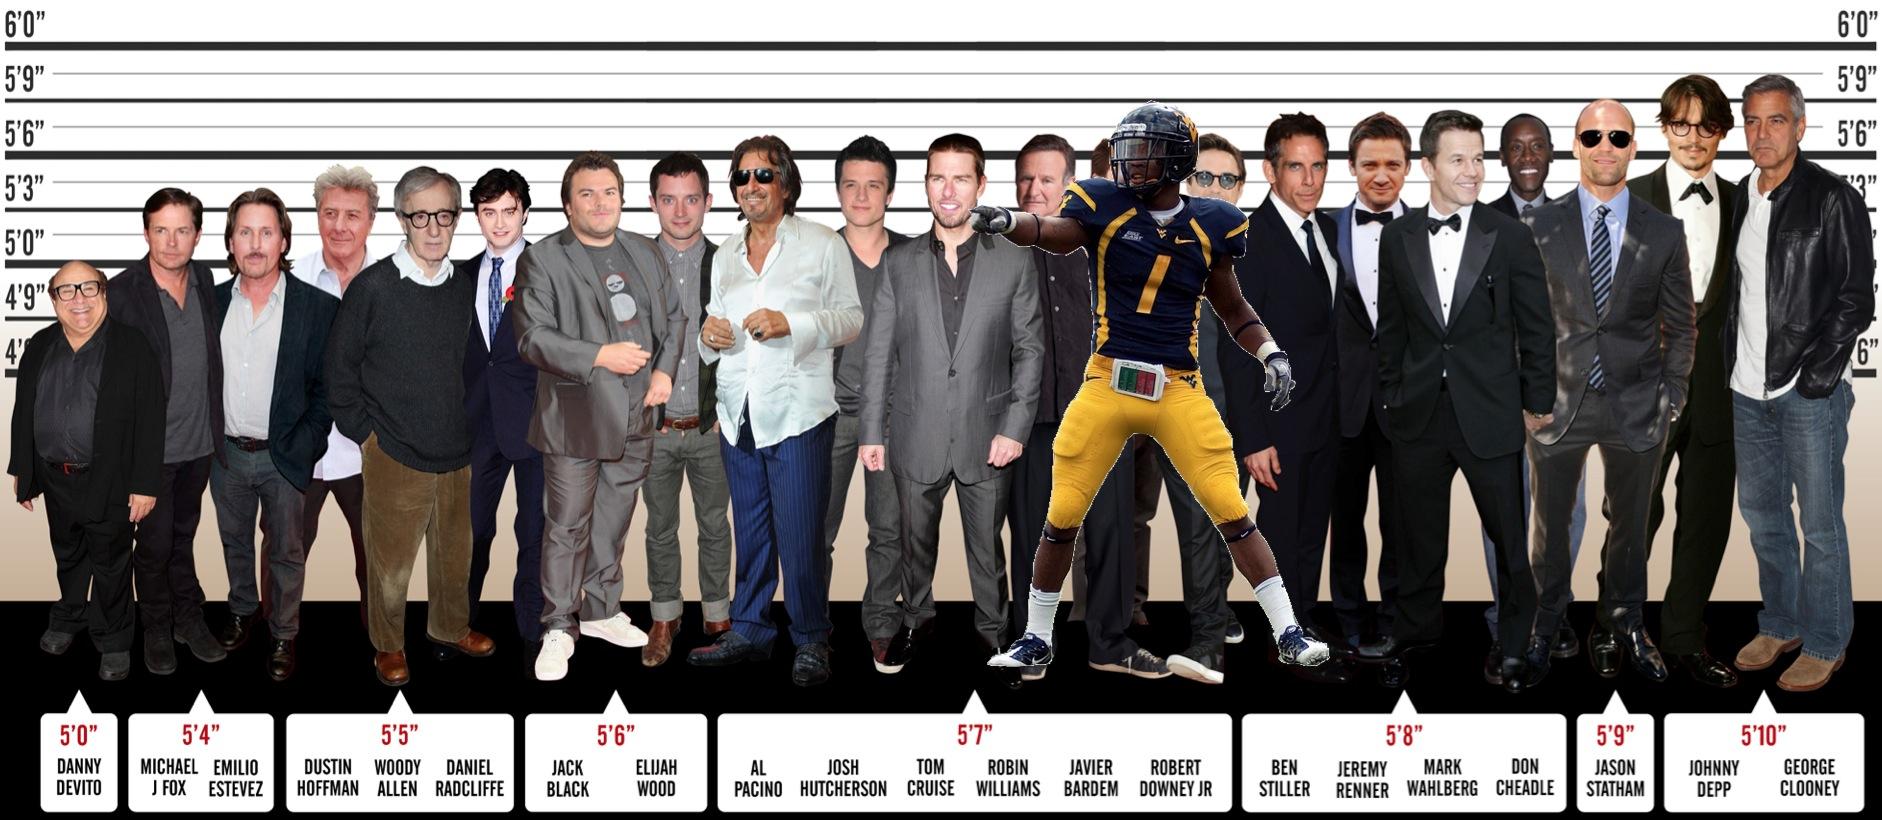 Tavon Austin: taller than Harry Potter, shorter than Captain Jack Sparrow.